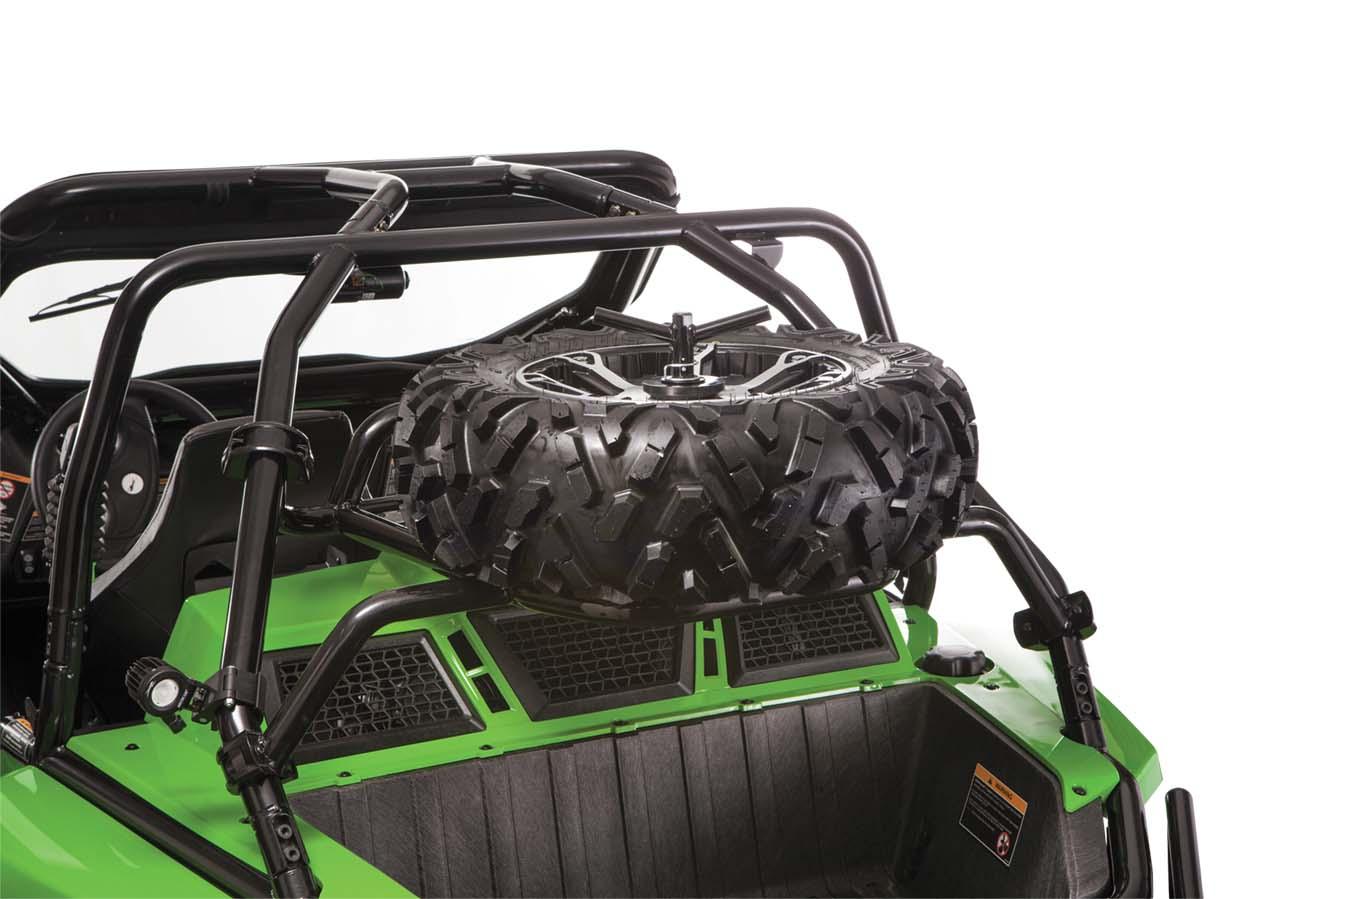 Speedrack Sprayer With 120 22 Boom Kit in addition 101962 likewise Kutvgr in addition 2017 En Bearcat 2000 Xt Es besides Dragonfire Door Panel Graphics RZR XP 1000 p 3375. on arctic cat wildcat bumpers